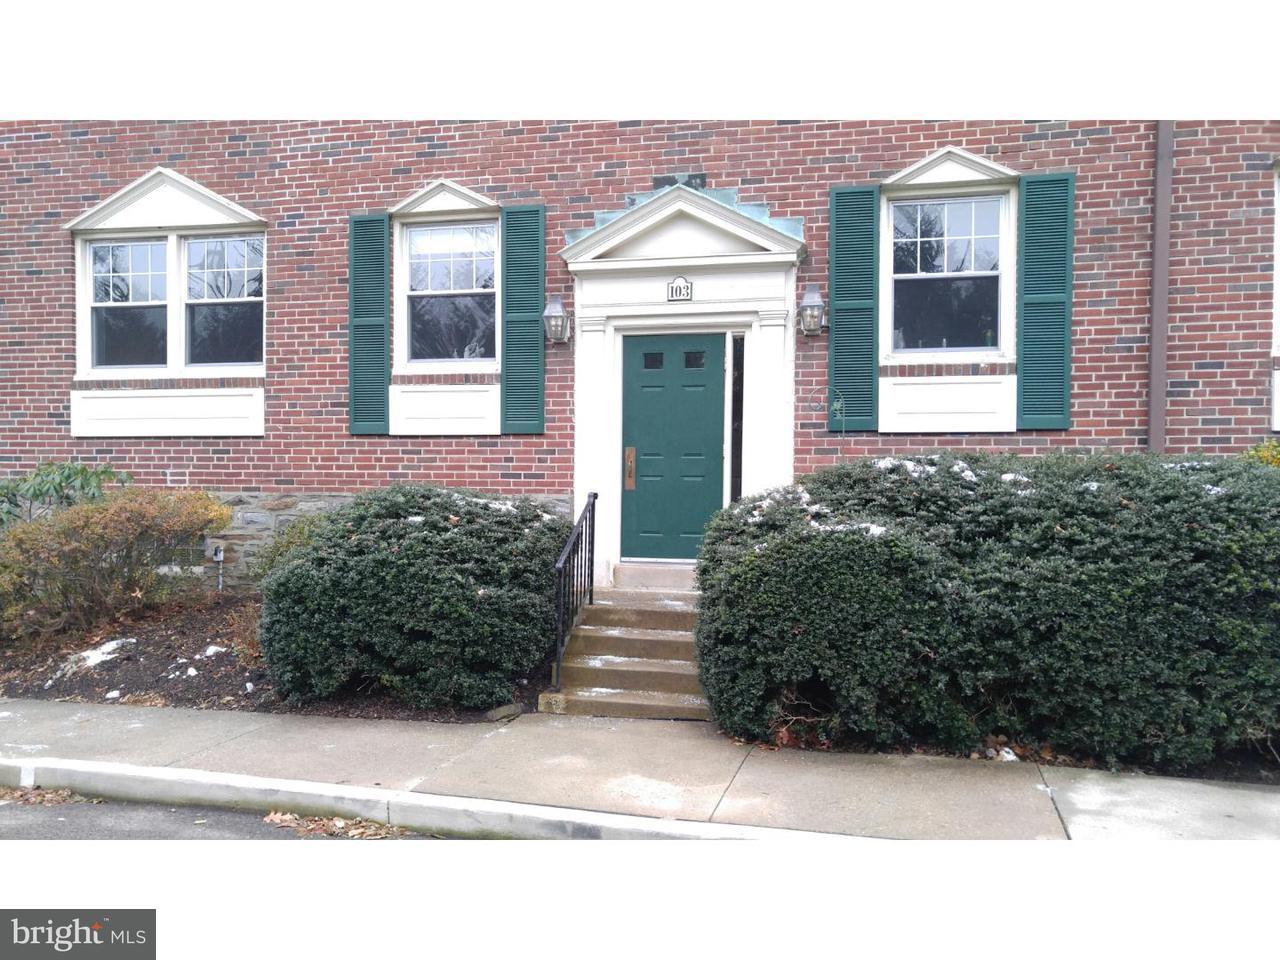 Single Family Home for Rent at 500 E LANCASTER AVE #103B Wayne, Pennsylvania 19087 United States